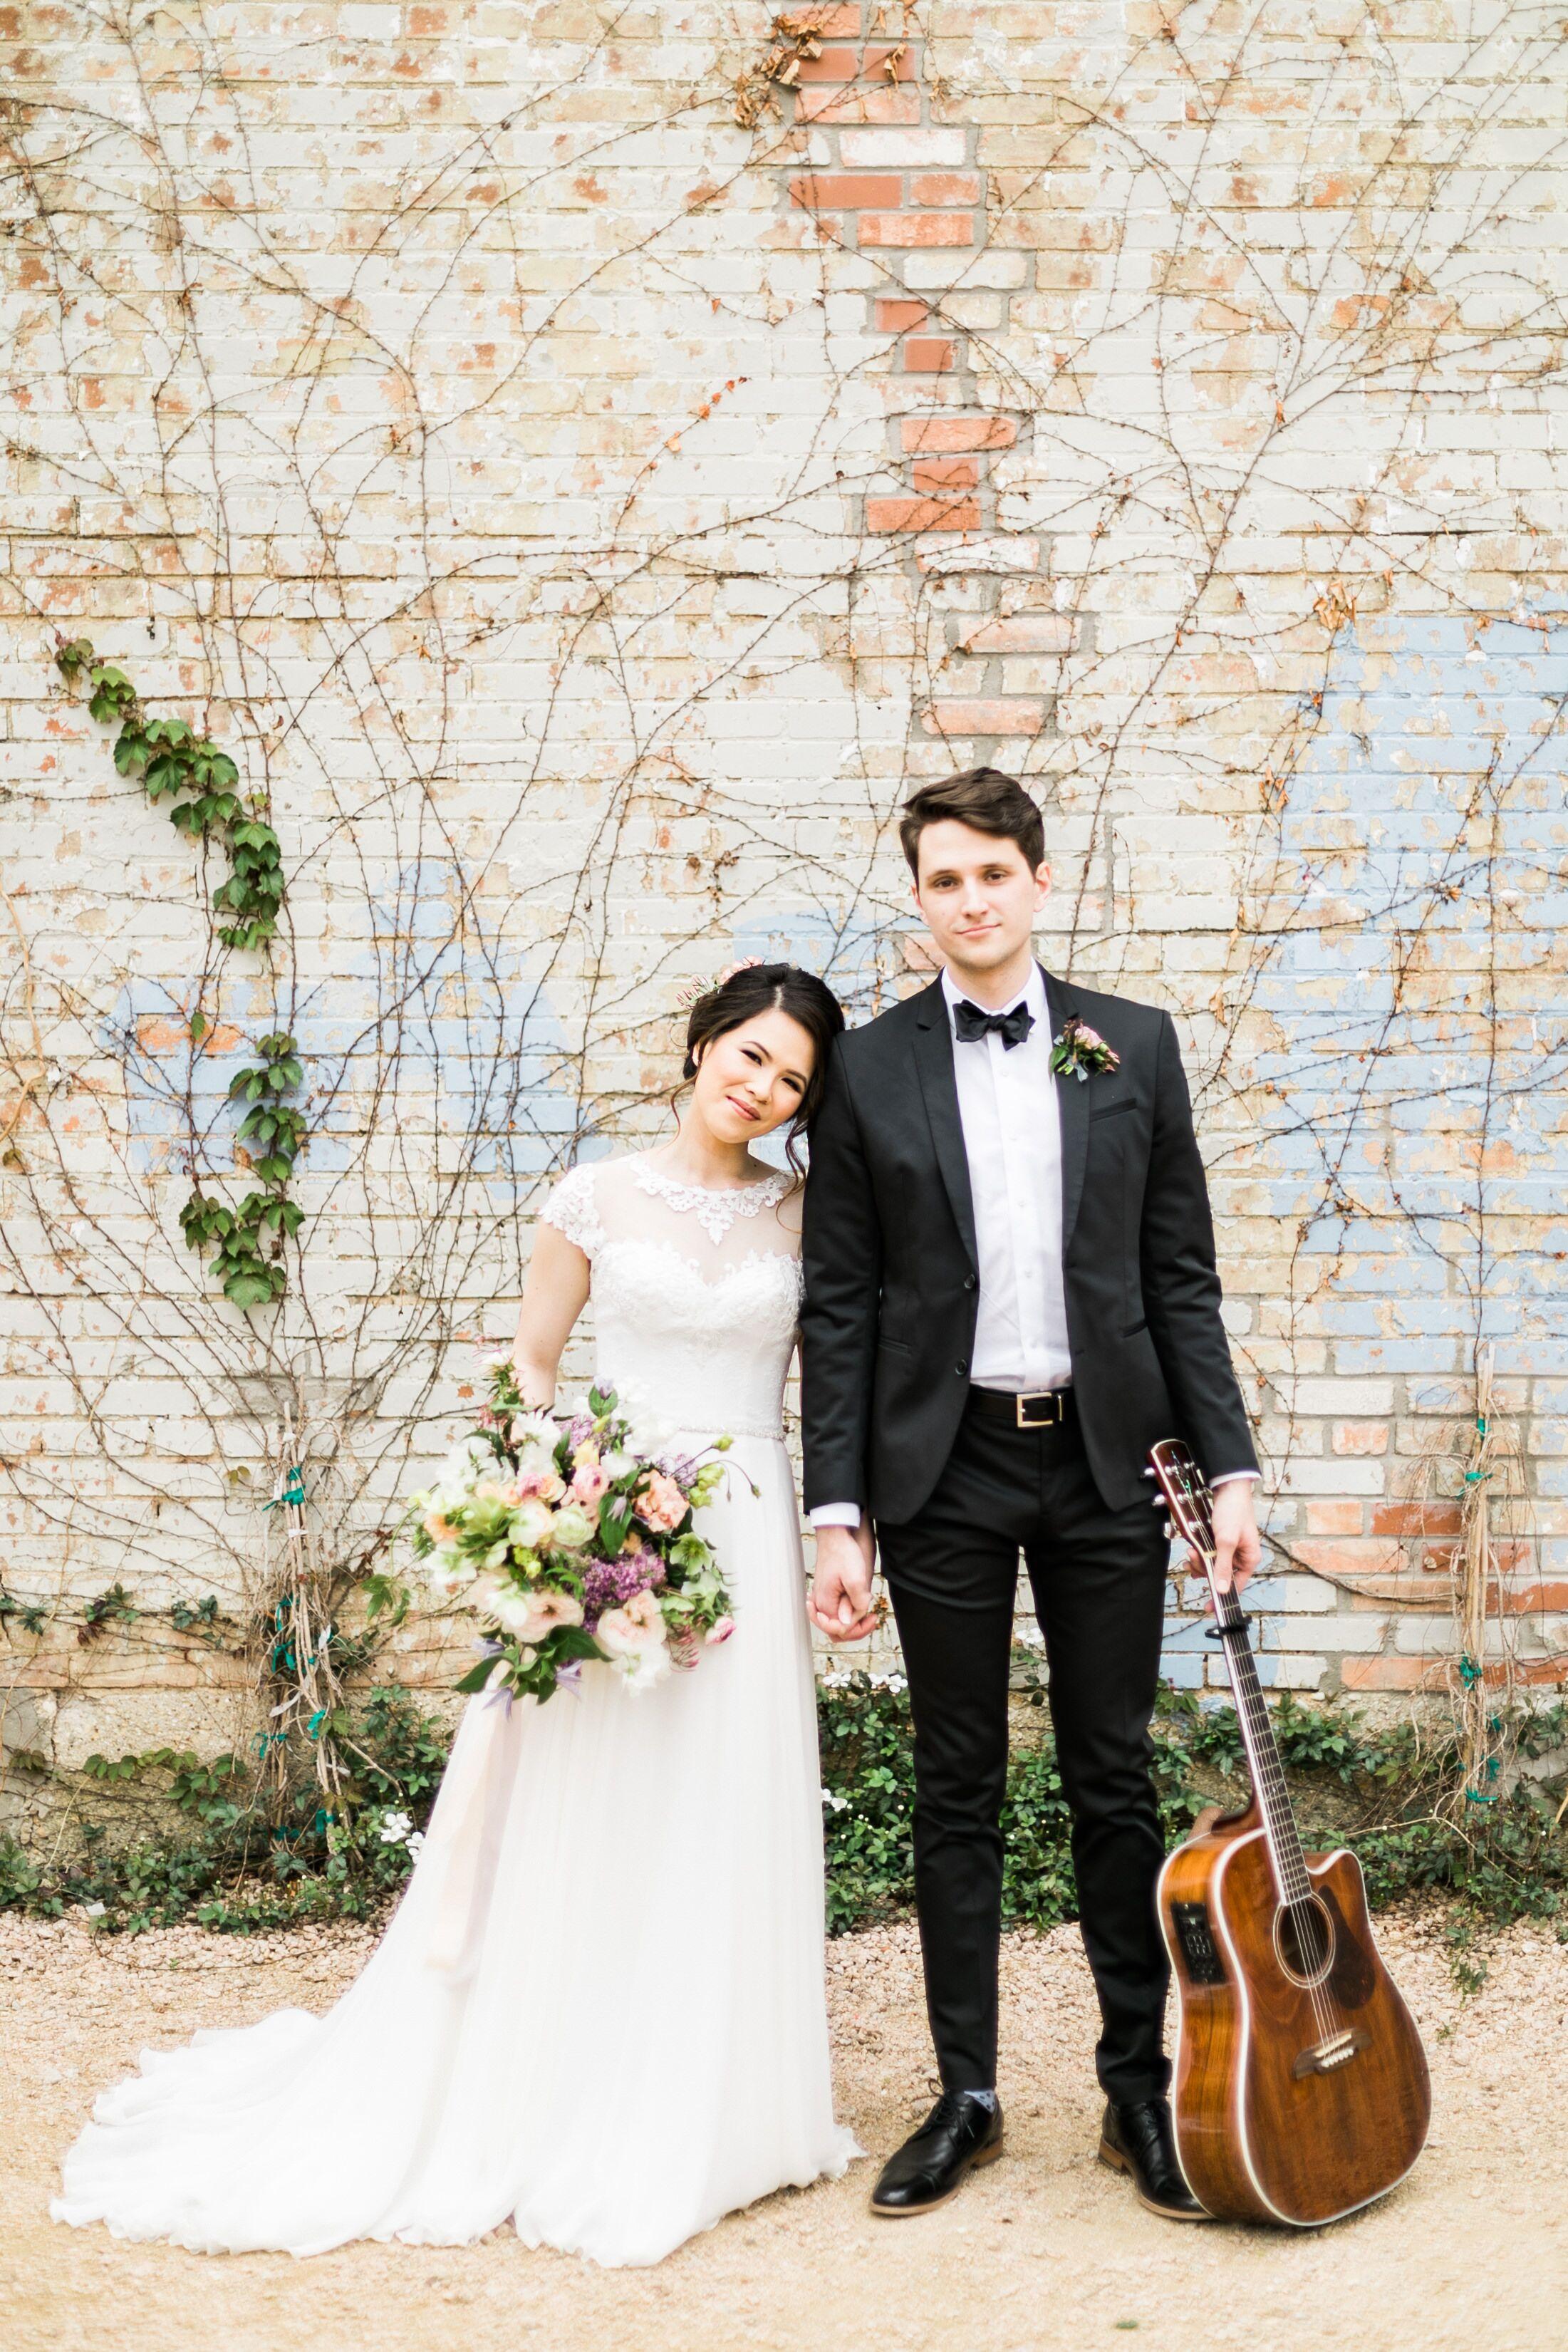 An Elegant Industrial Wedding At Brik Venue In Fort Worth Texas